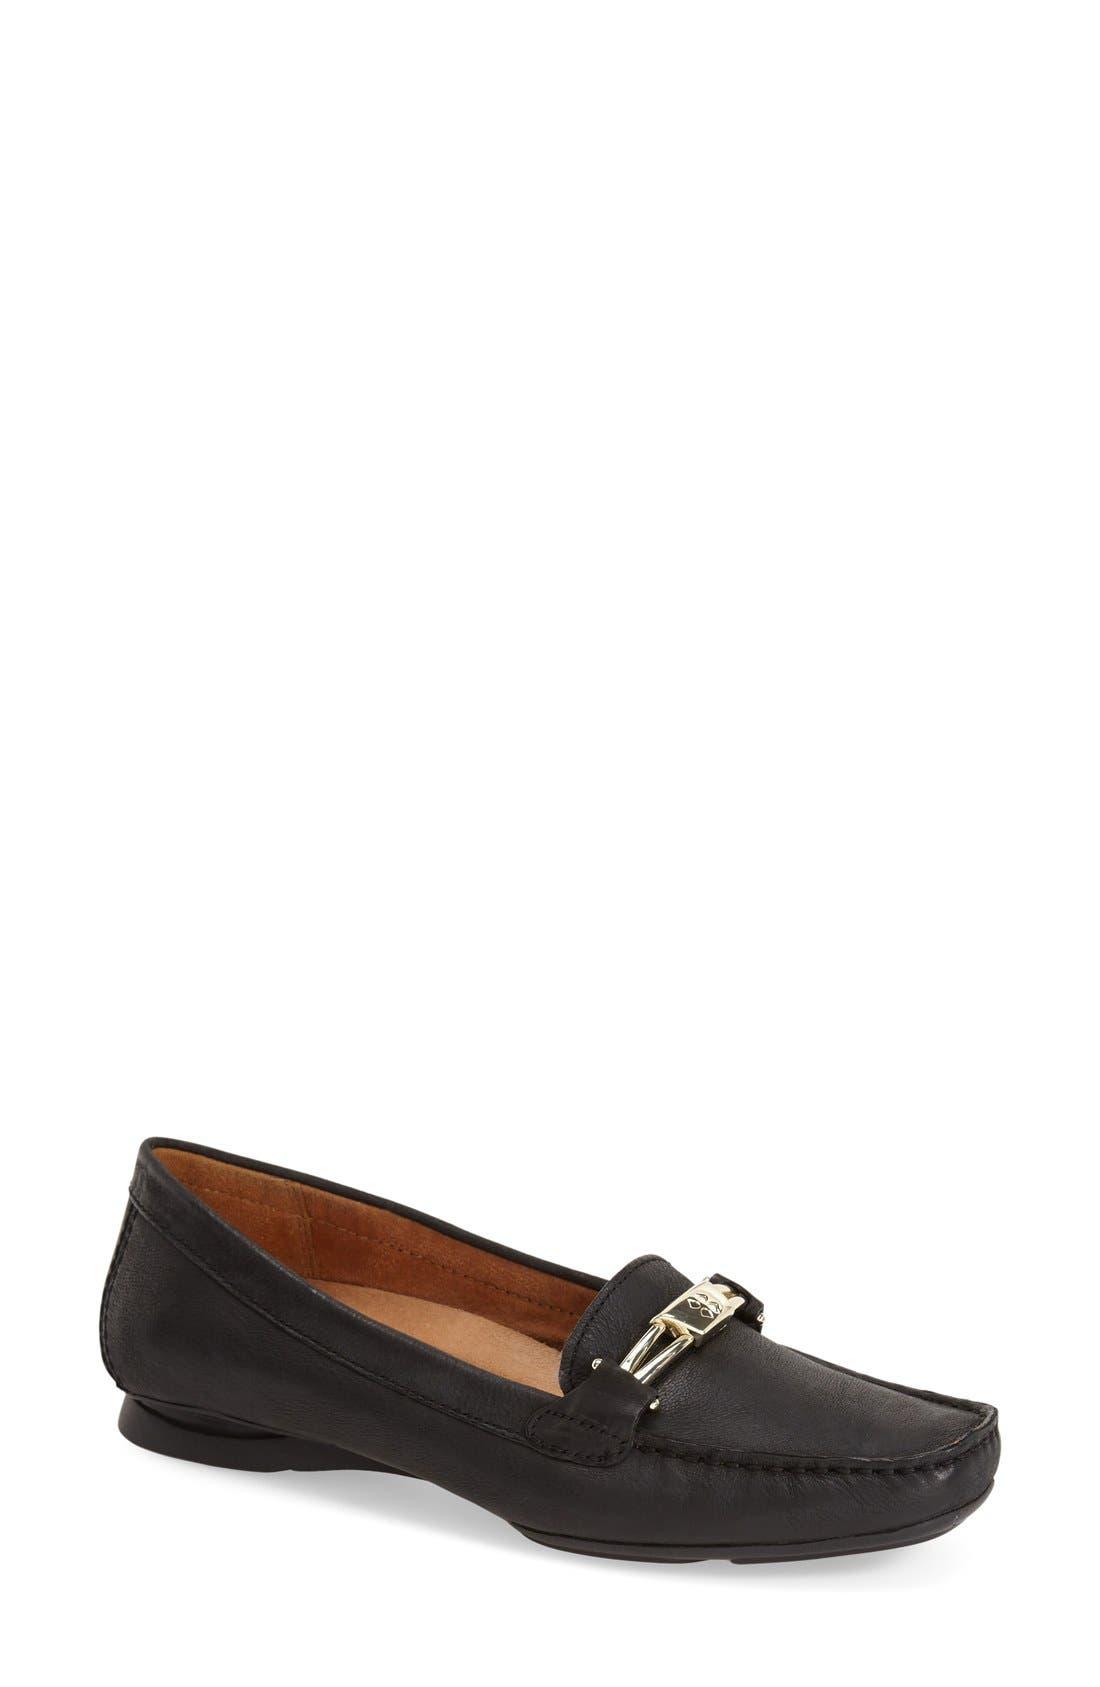 'Saturday' Loafer,                         Main,                         color, Black